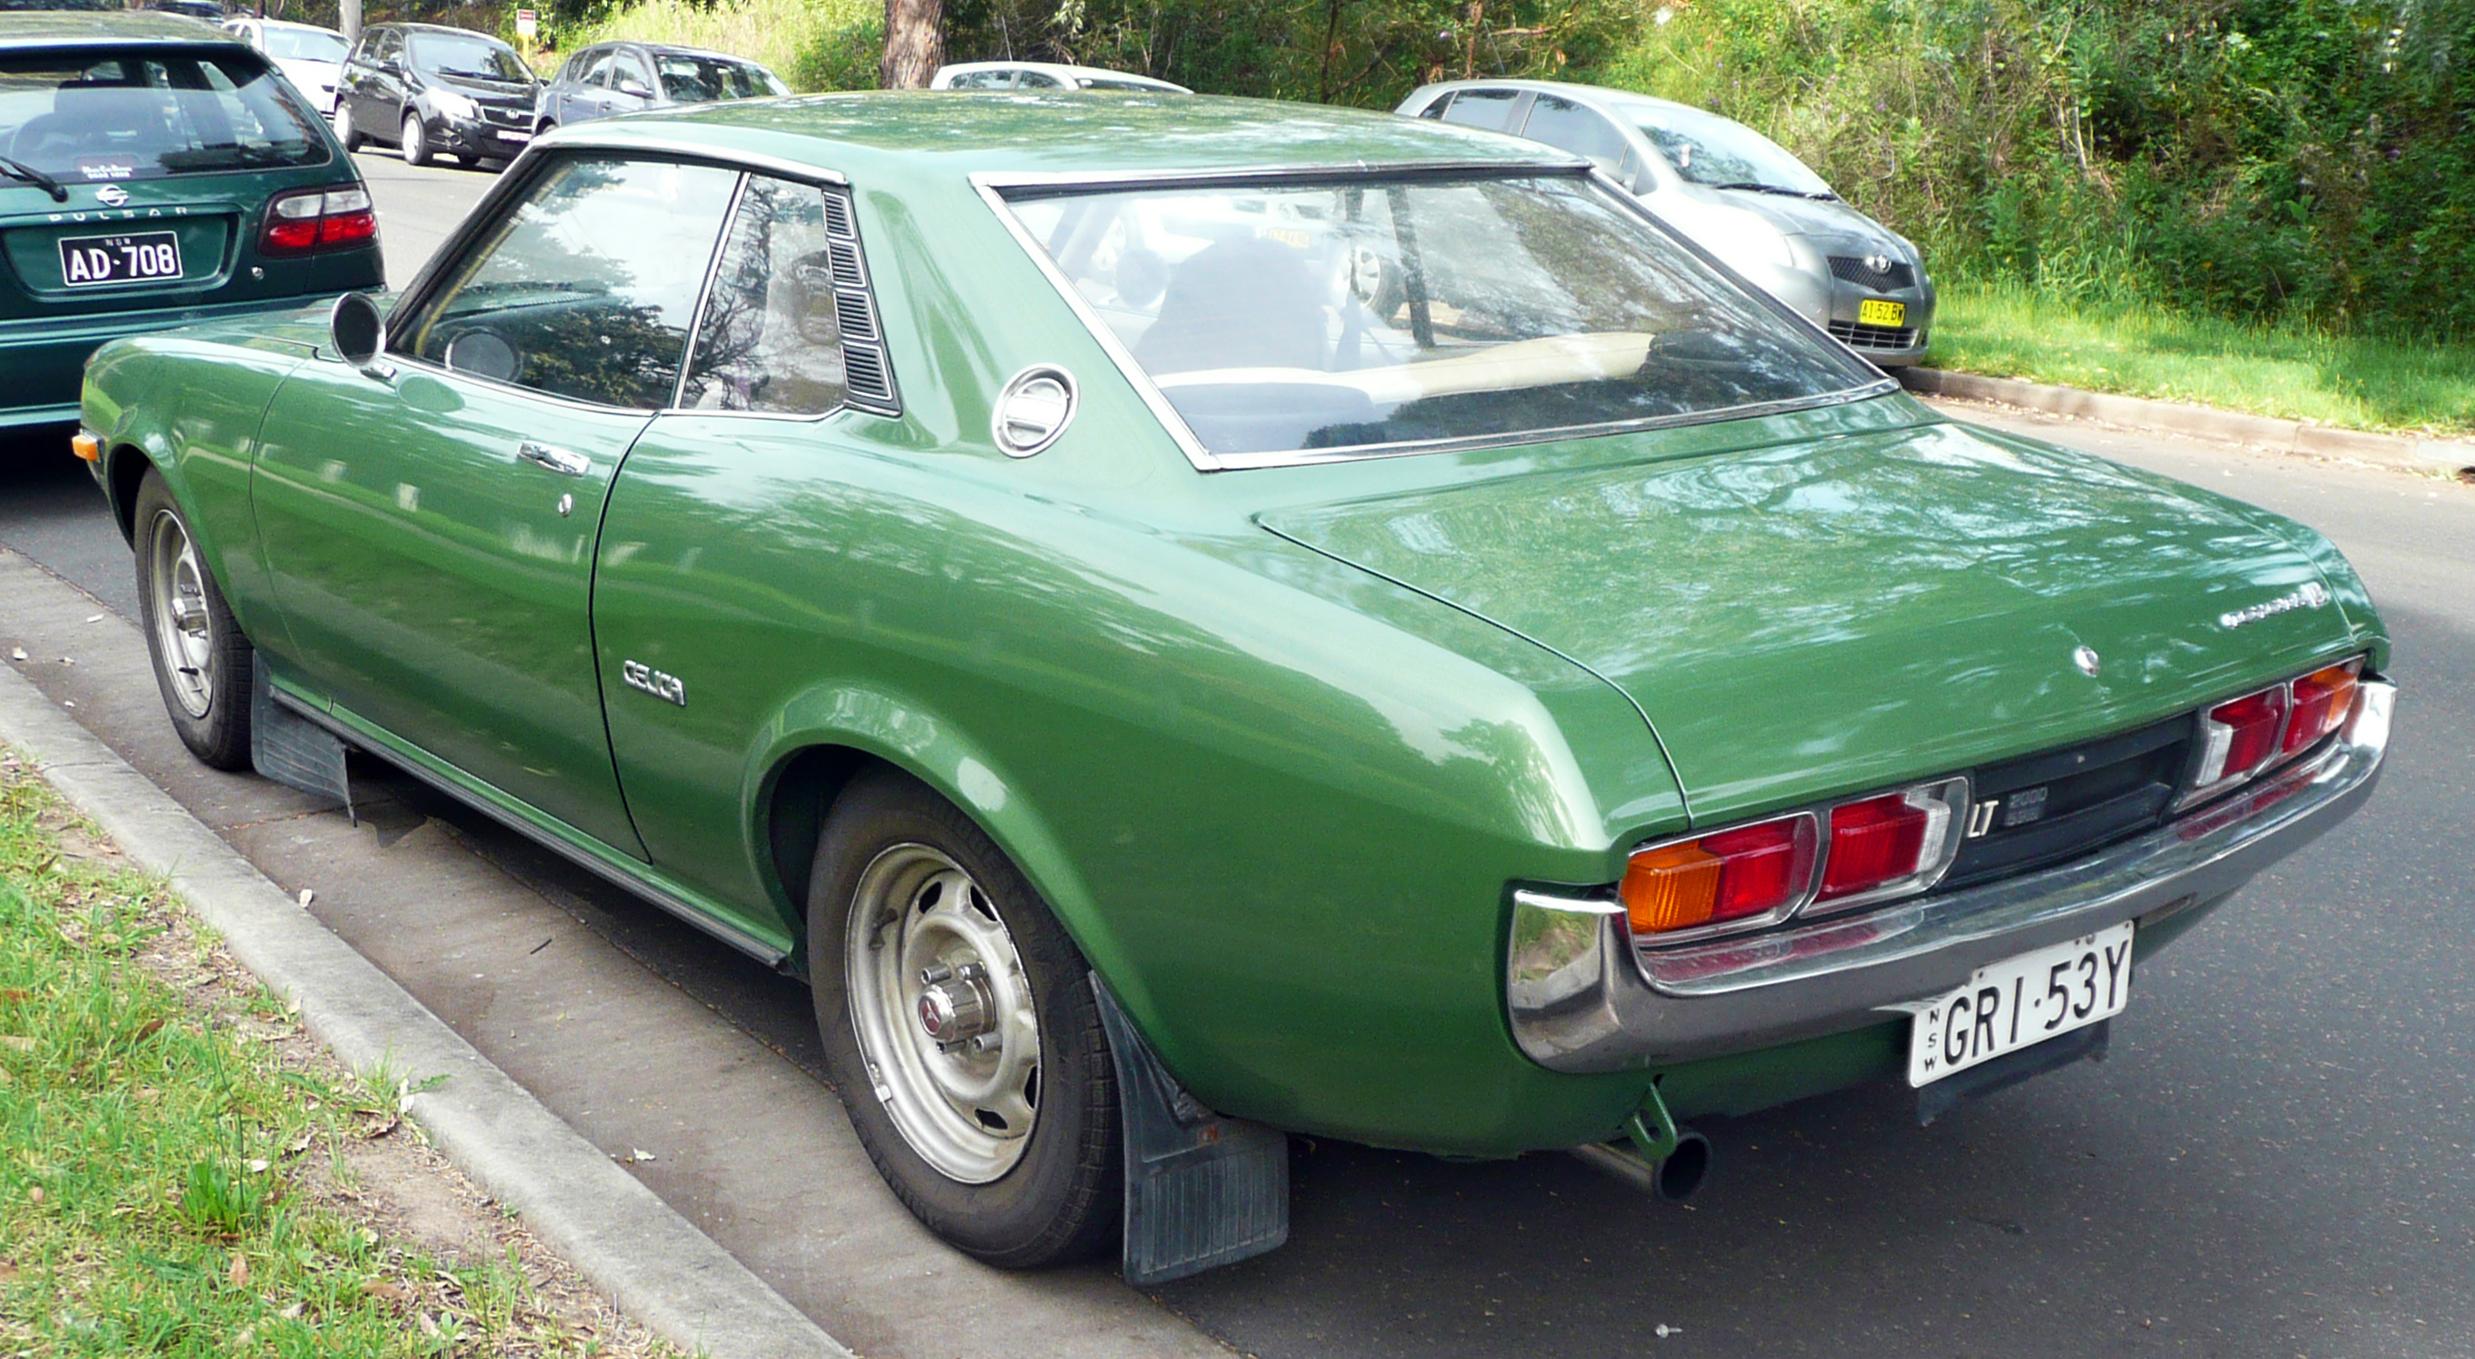 Toyota Celica Lt 1977 >> File:1976-1977 Toyota Celica (RA23) LT hardtop 02.jpg - Wikipedia